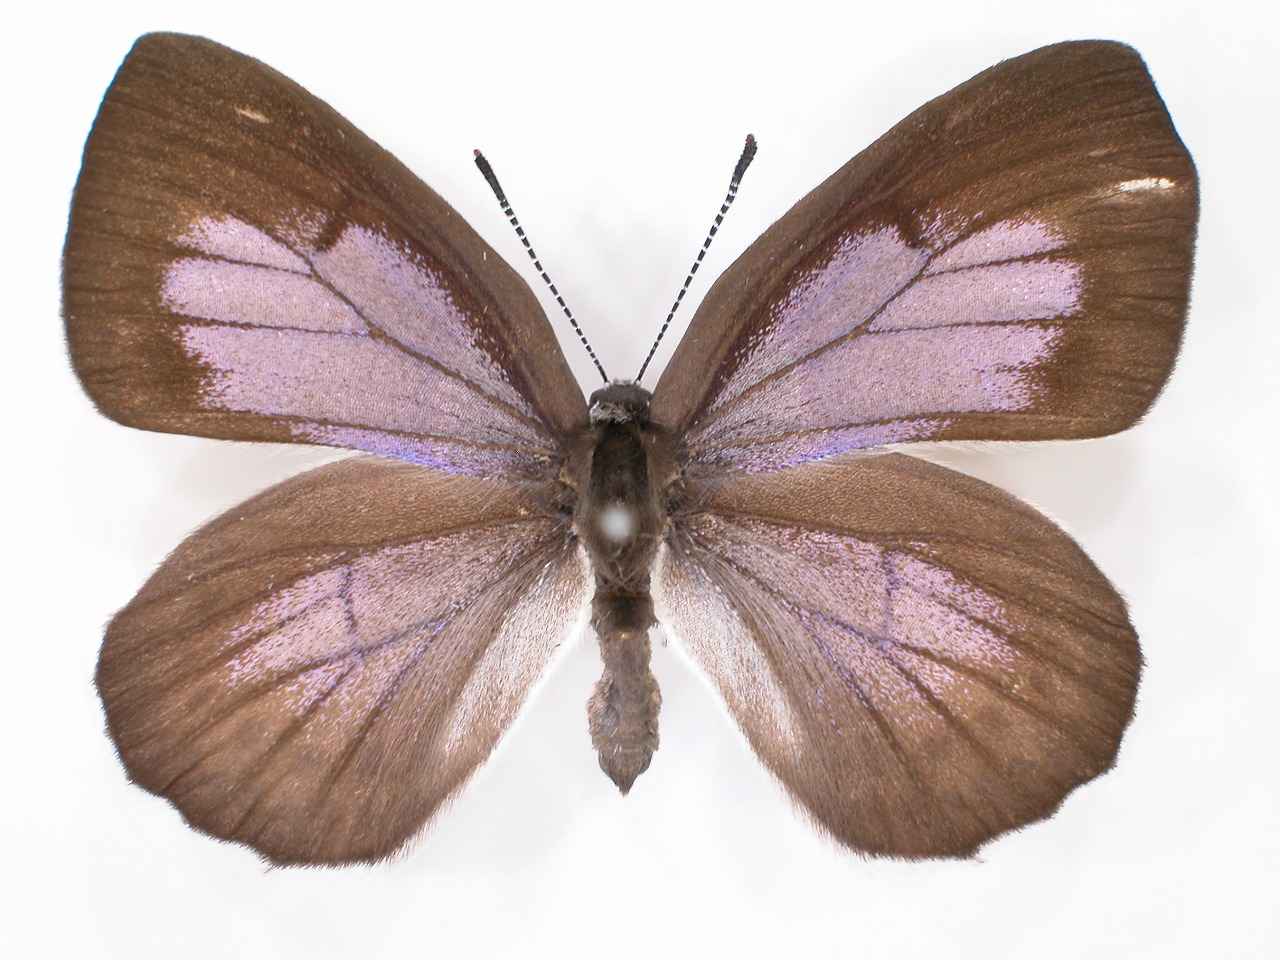 https://www.hitohaku.jp/material/l-material/butterfly-wing/5-lycaenidae/B1-637834_A.jpg